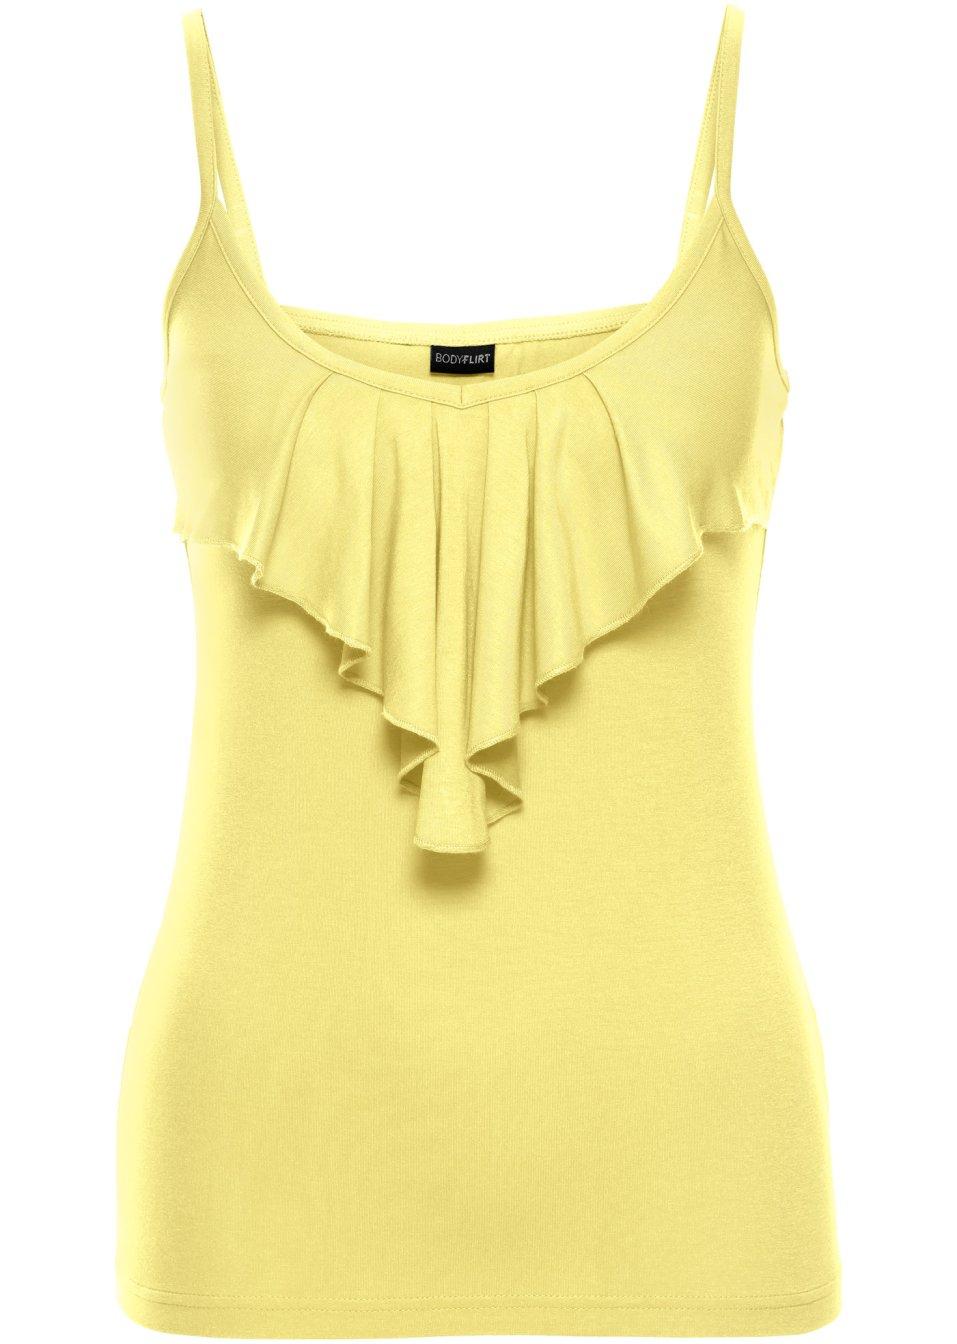 Bluzka top falbana klasyczna 36/38 żółta KM235